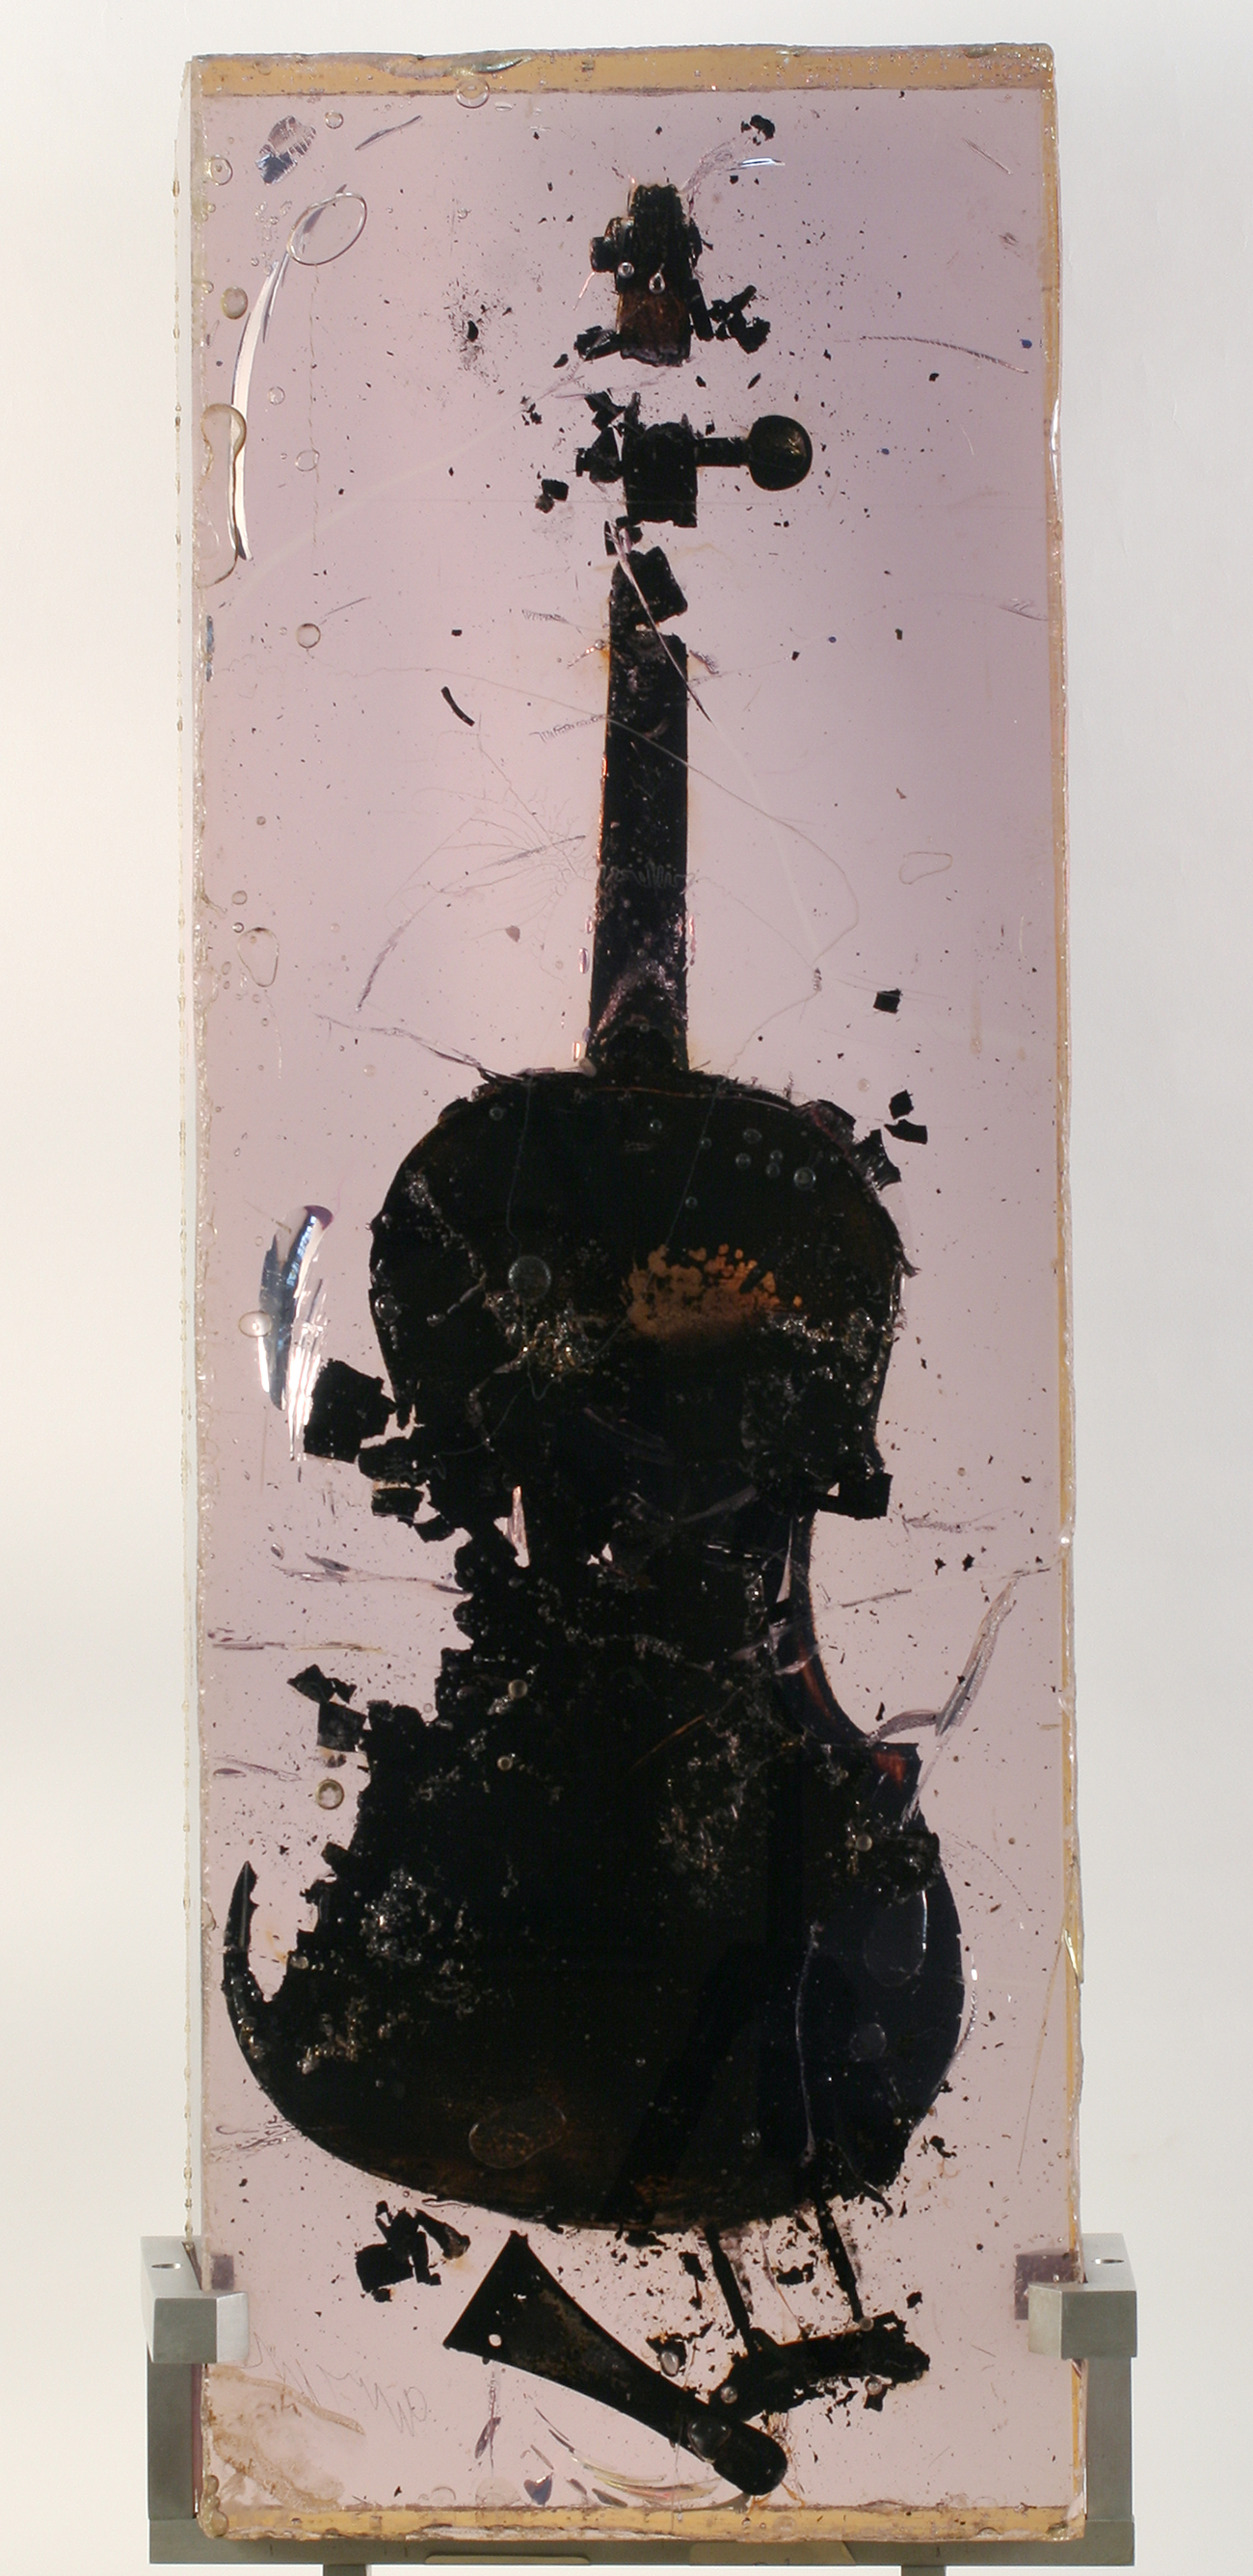 Fernand Arman. Burned violin. 1966 / Pushkin State Museum of Fine Arts